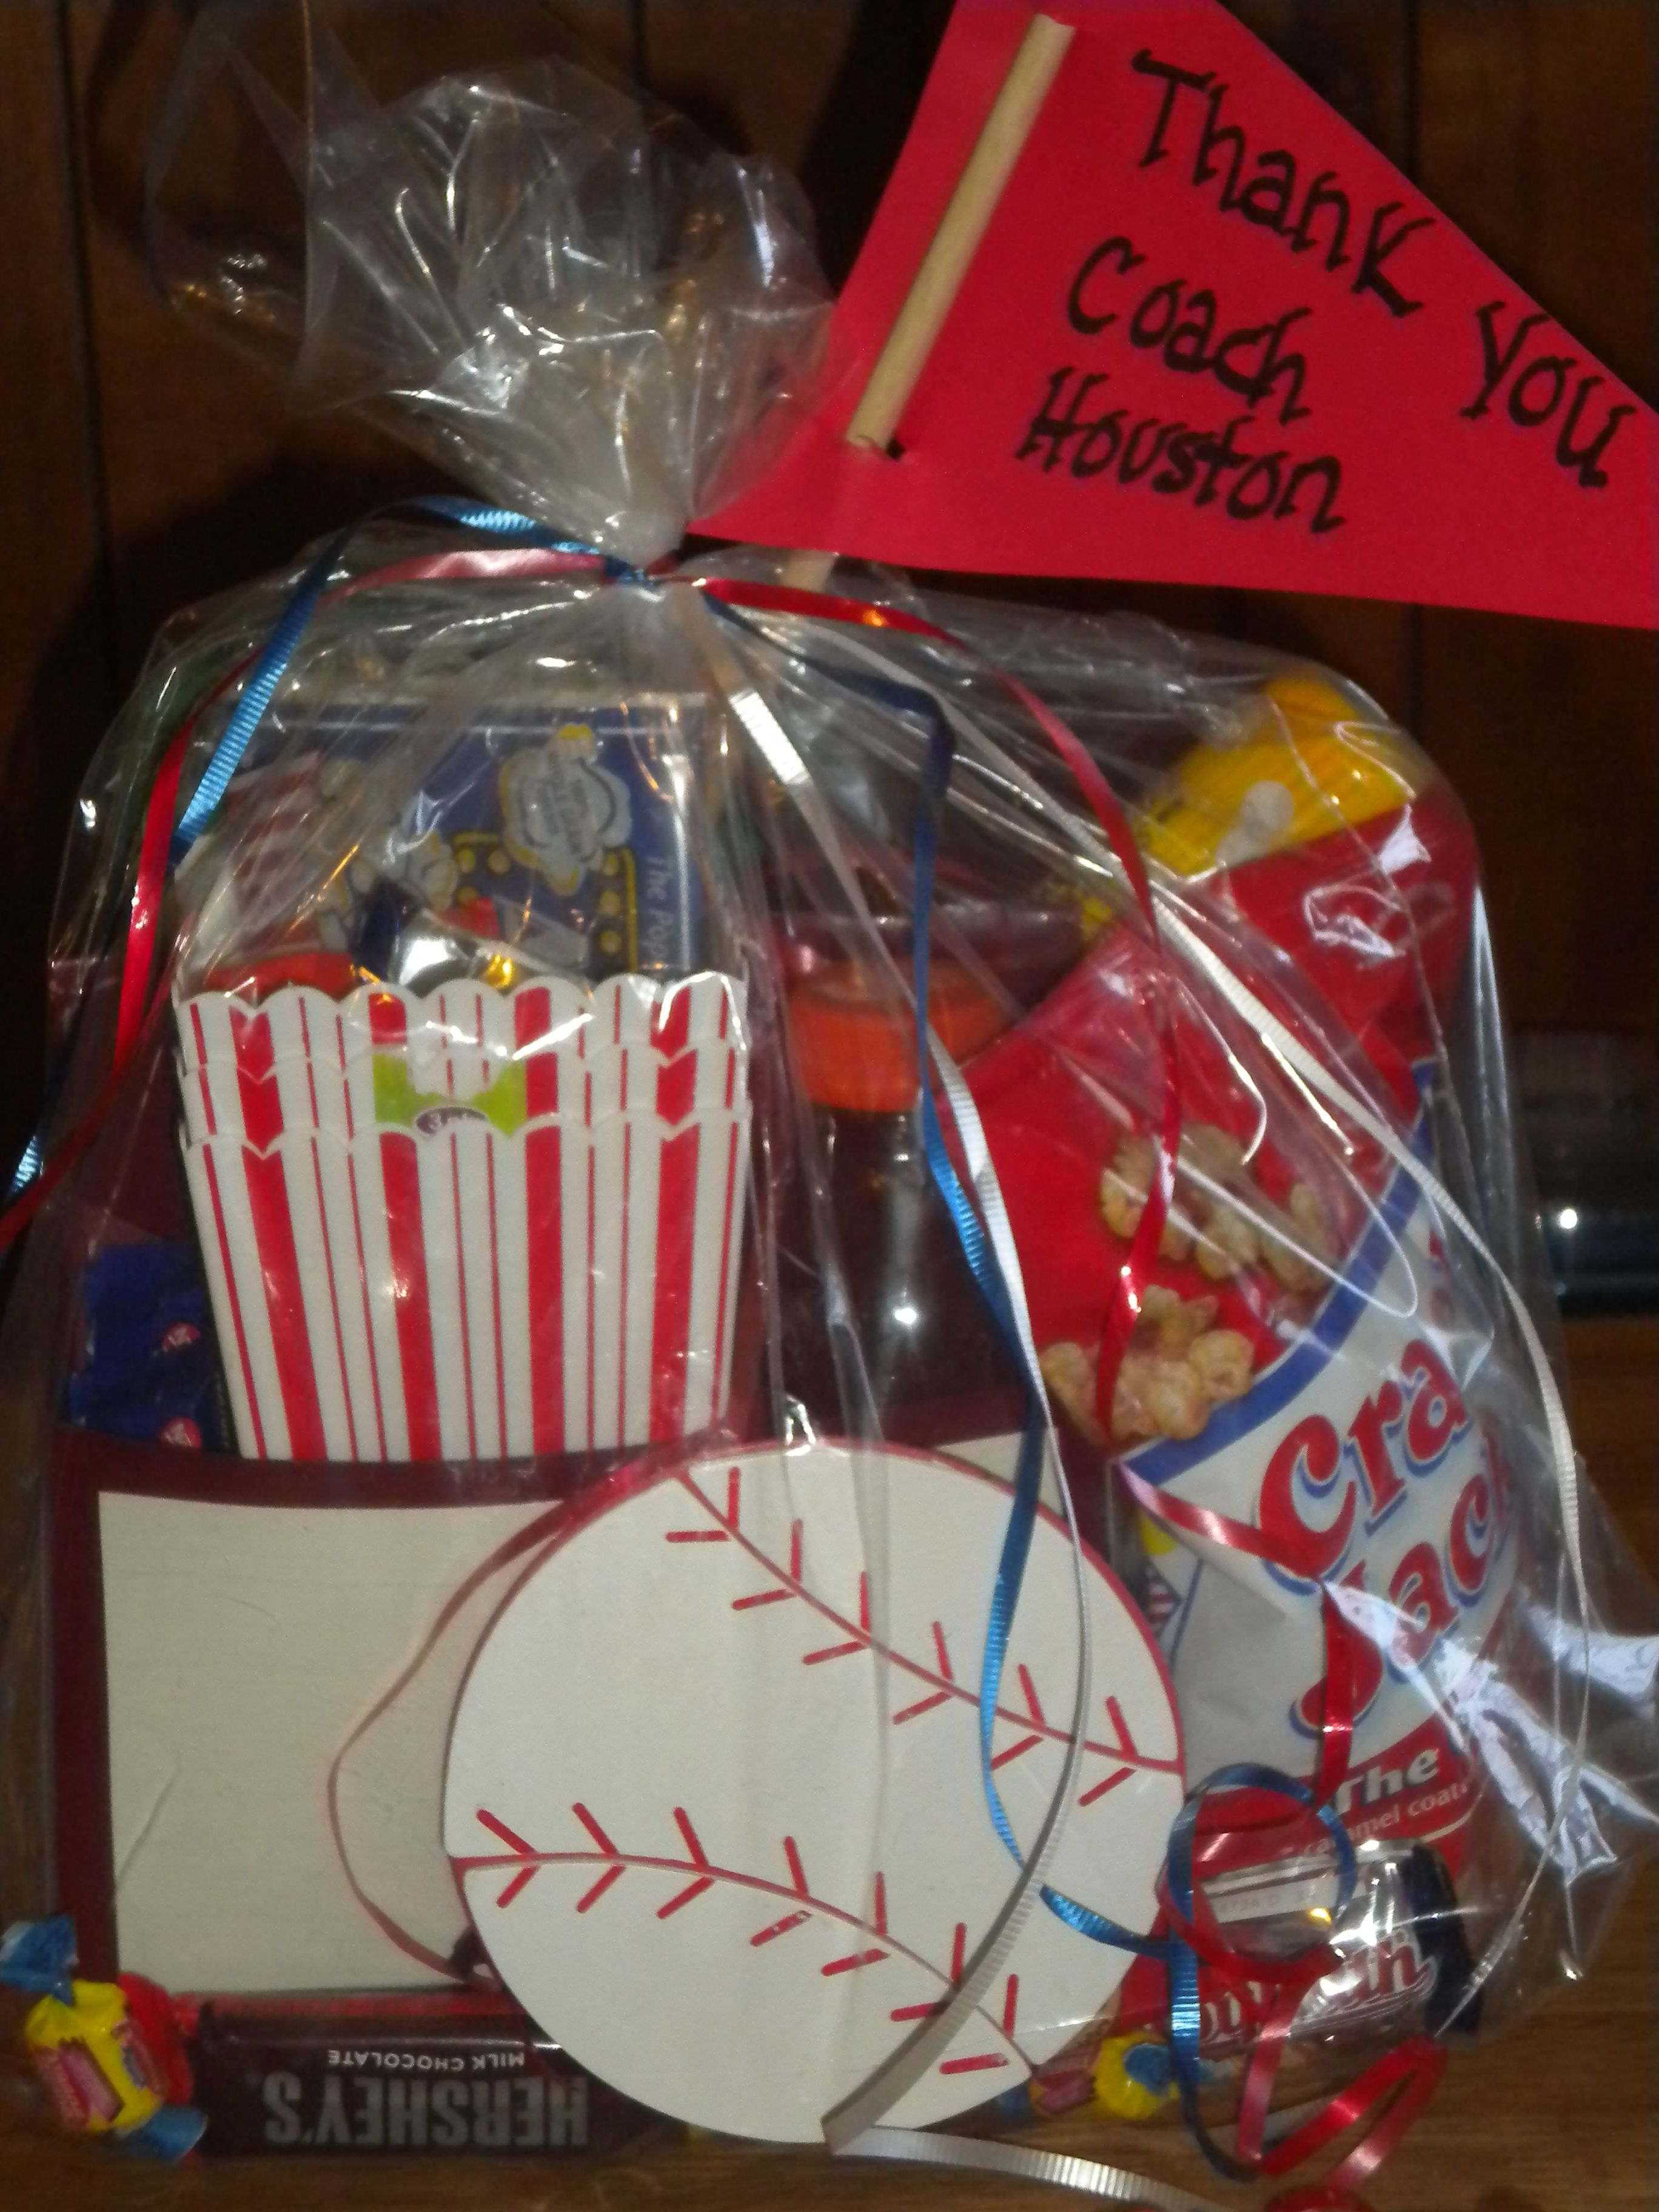 Coach giftpopcorn buckets popcorn peanuts cracker